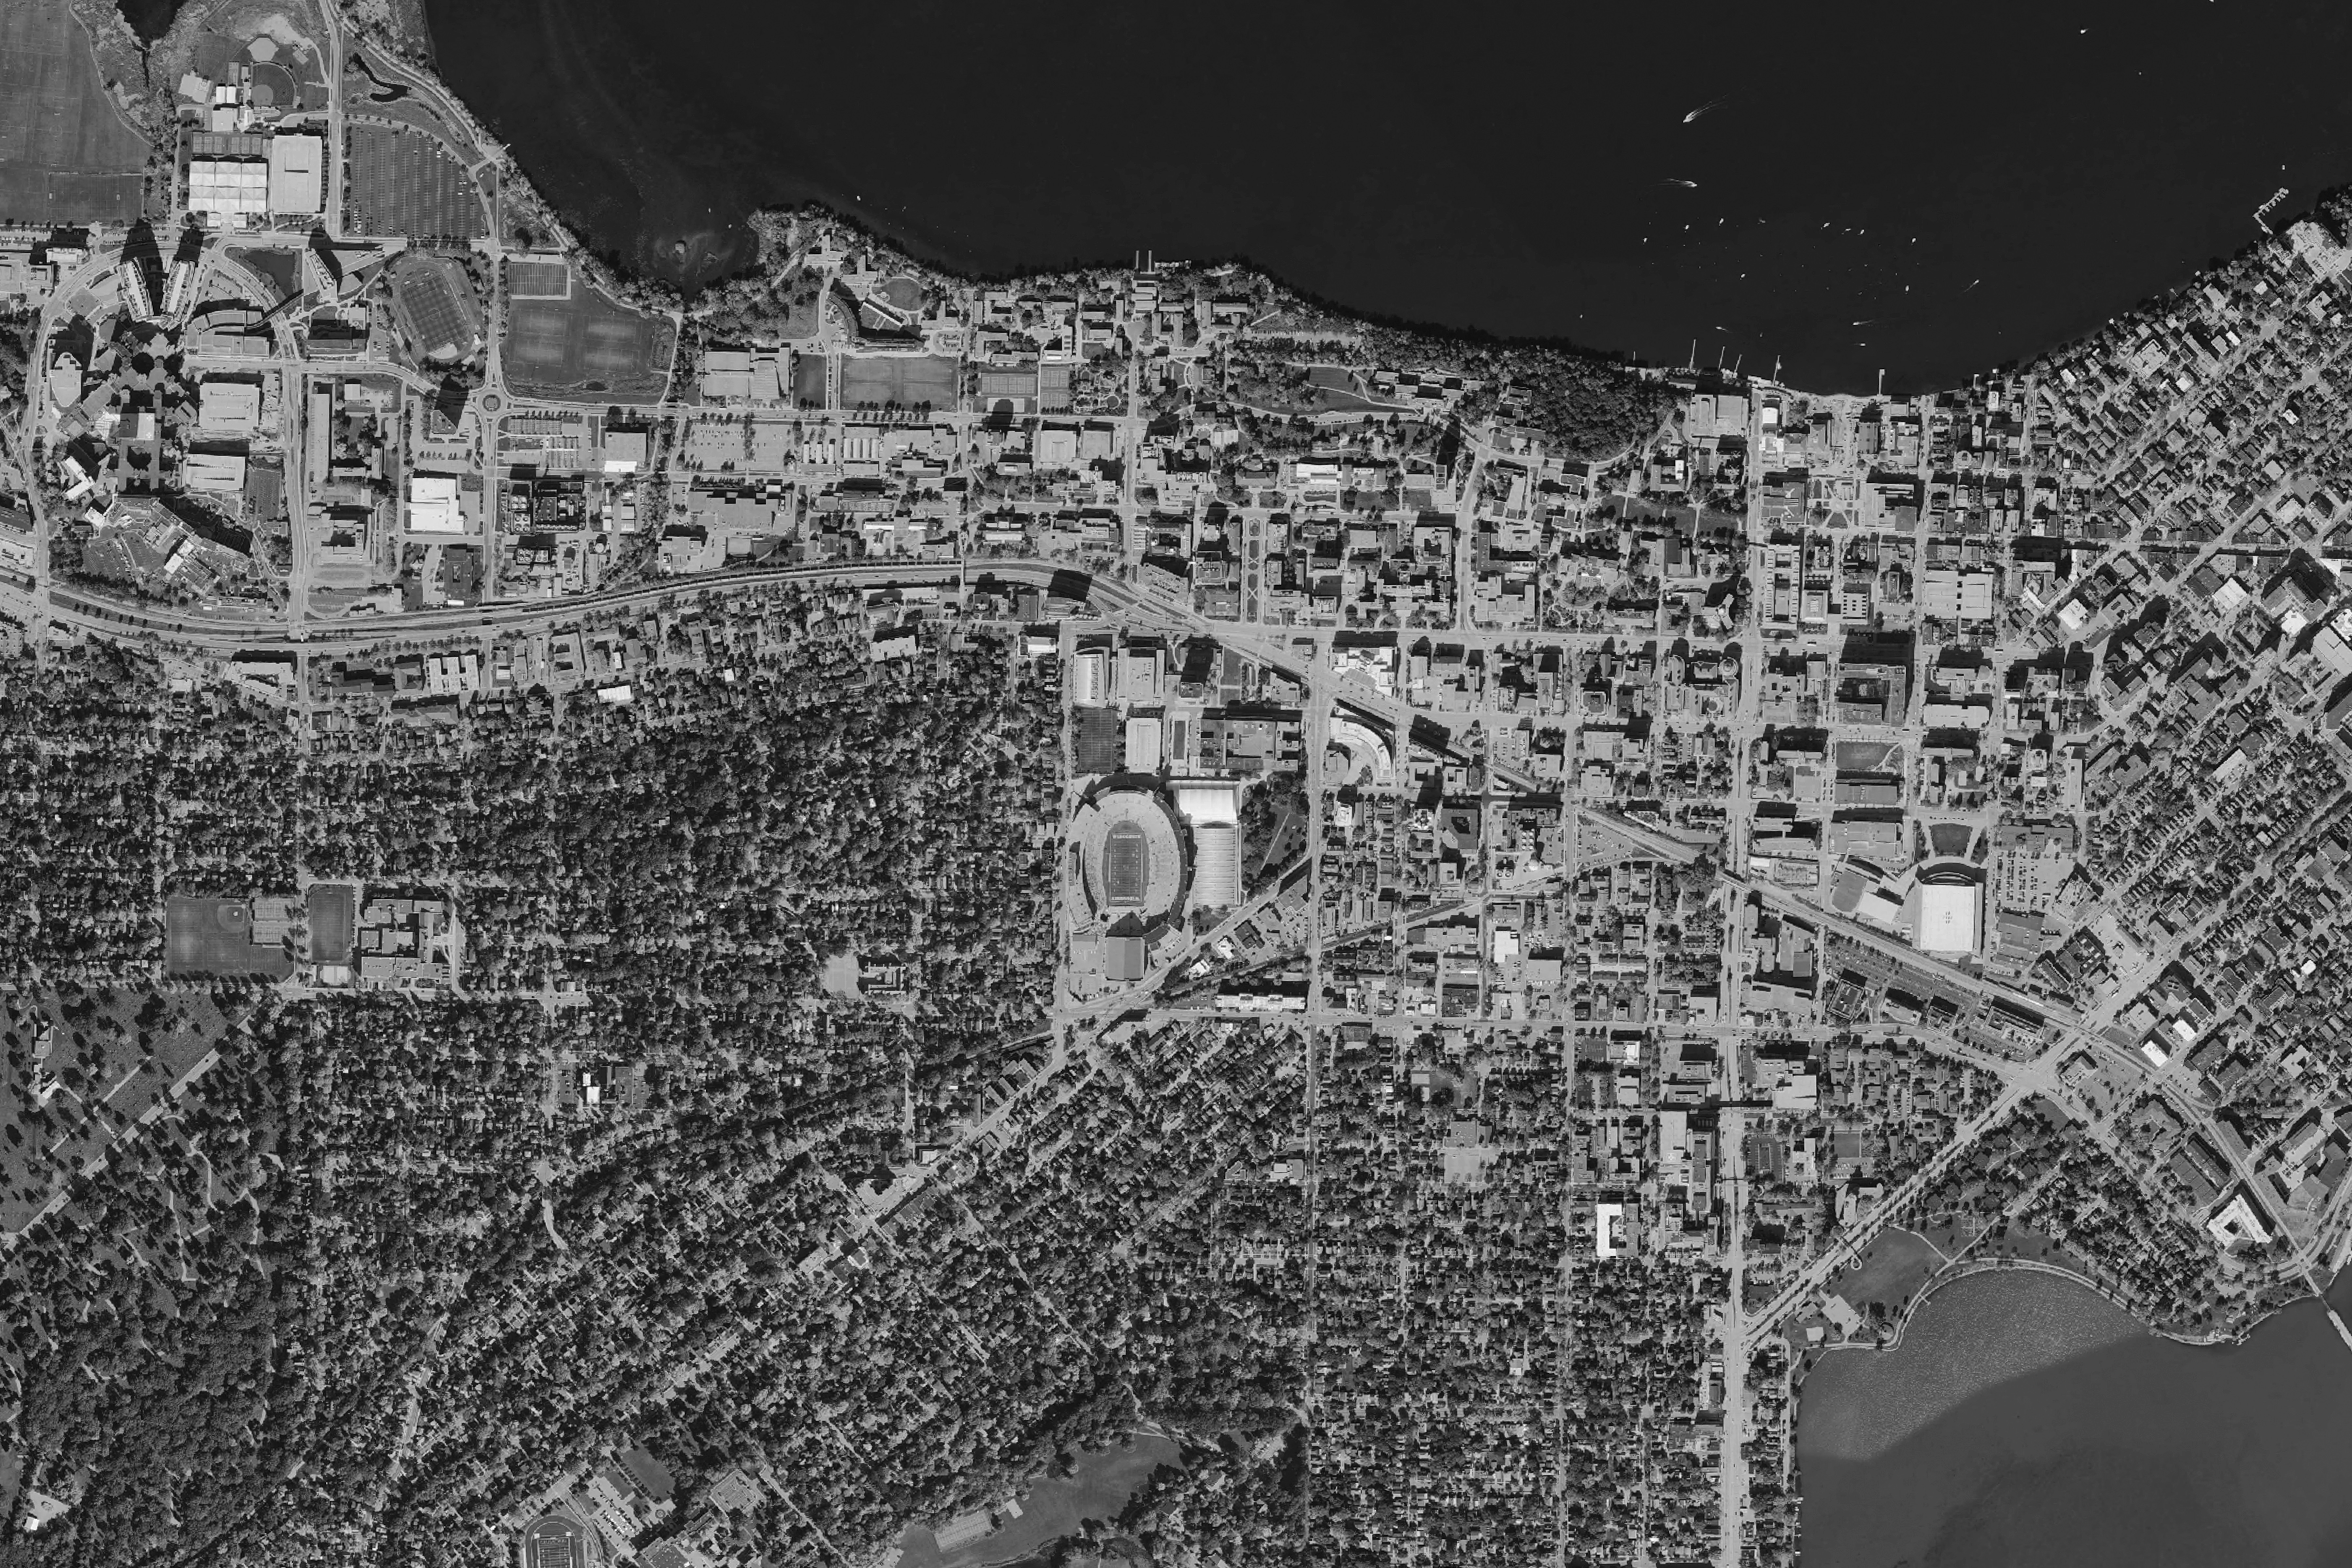 University Of Wisconsin Madison Aerial Photo 2015 Black White